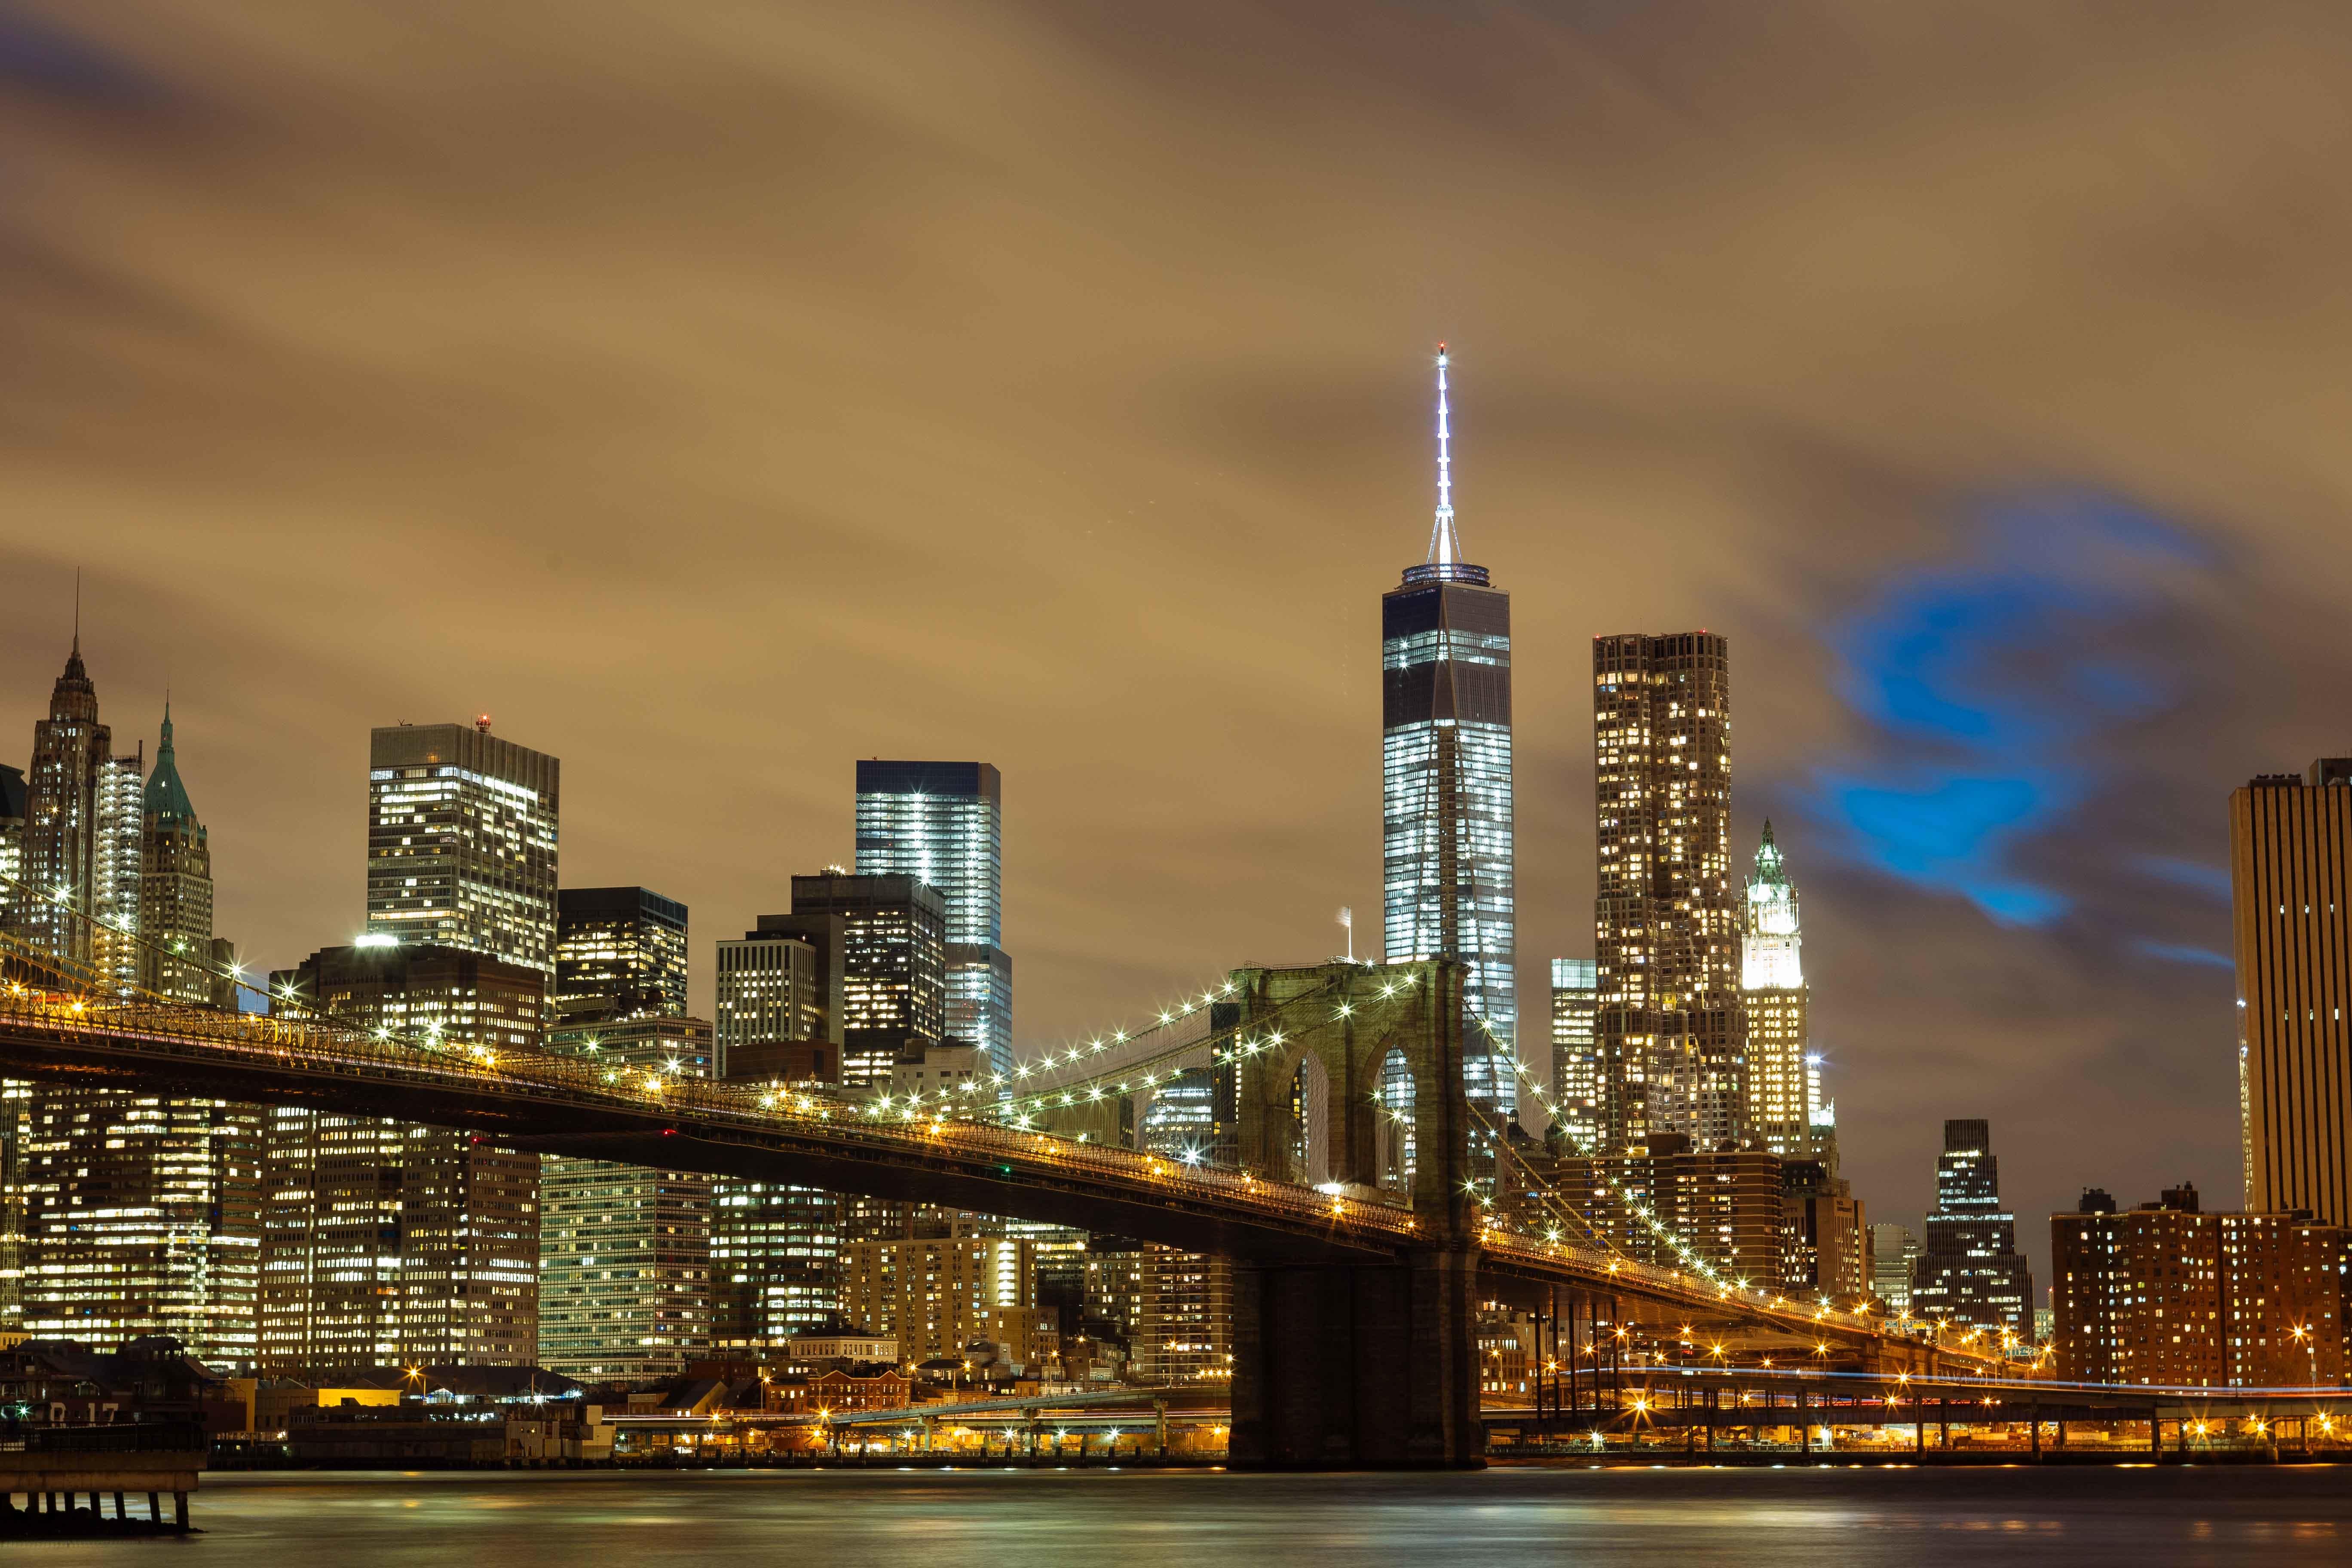 Brooklyn to manhattan bridge, brooklyn, new york, night, lights, bridges, brooklyn, lights